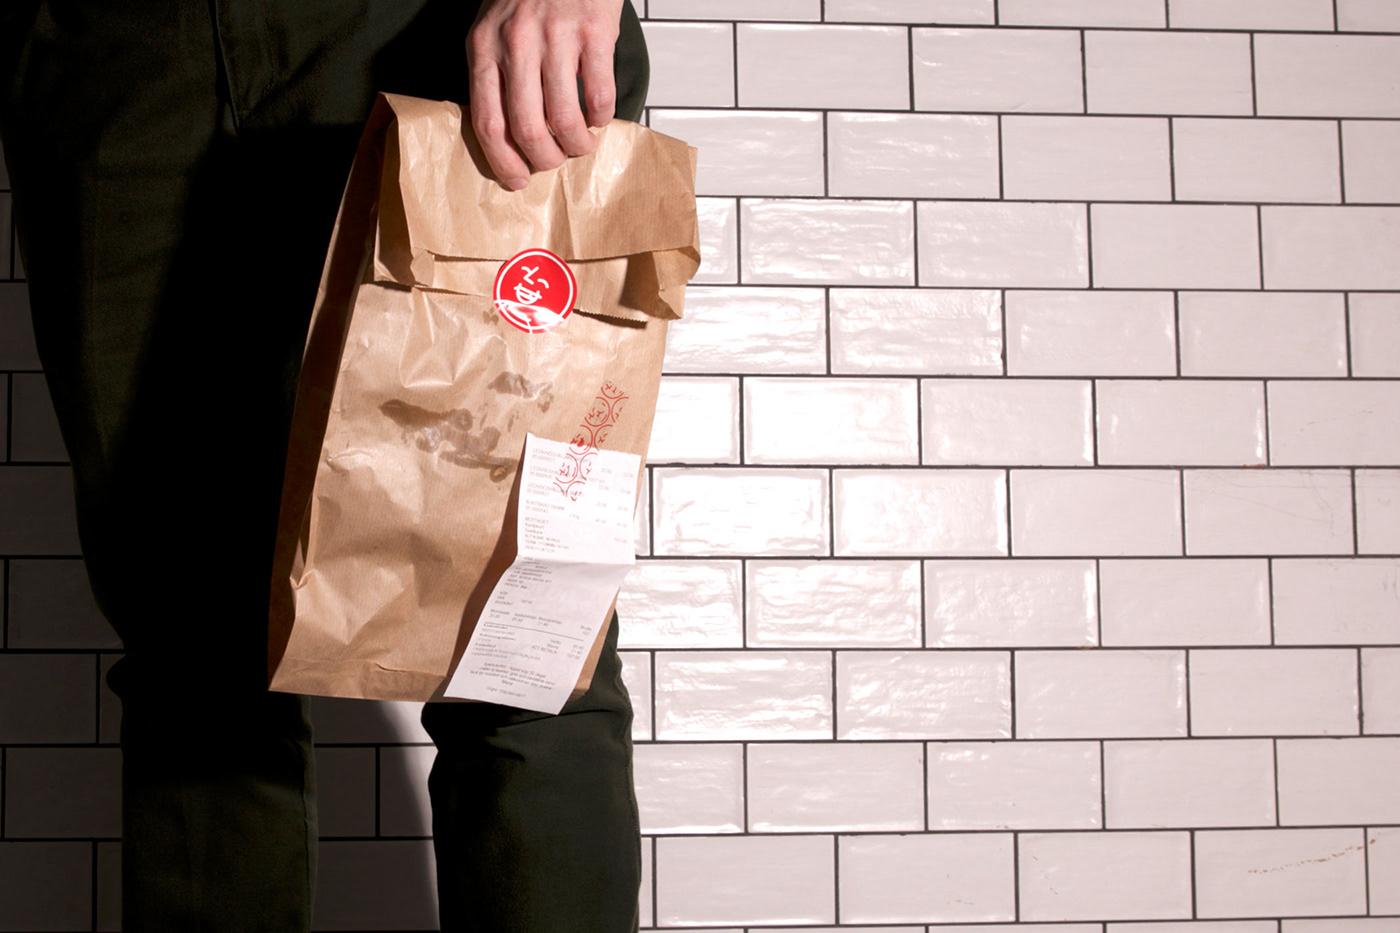 bar bistro branding  logo red restaurant Fast food identity Street Food visual identity